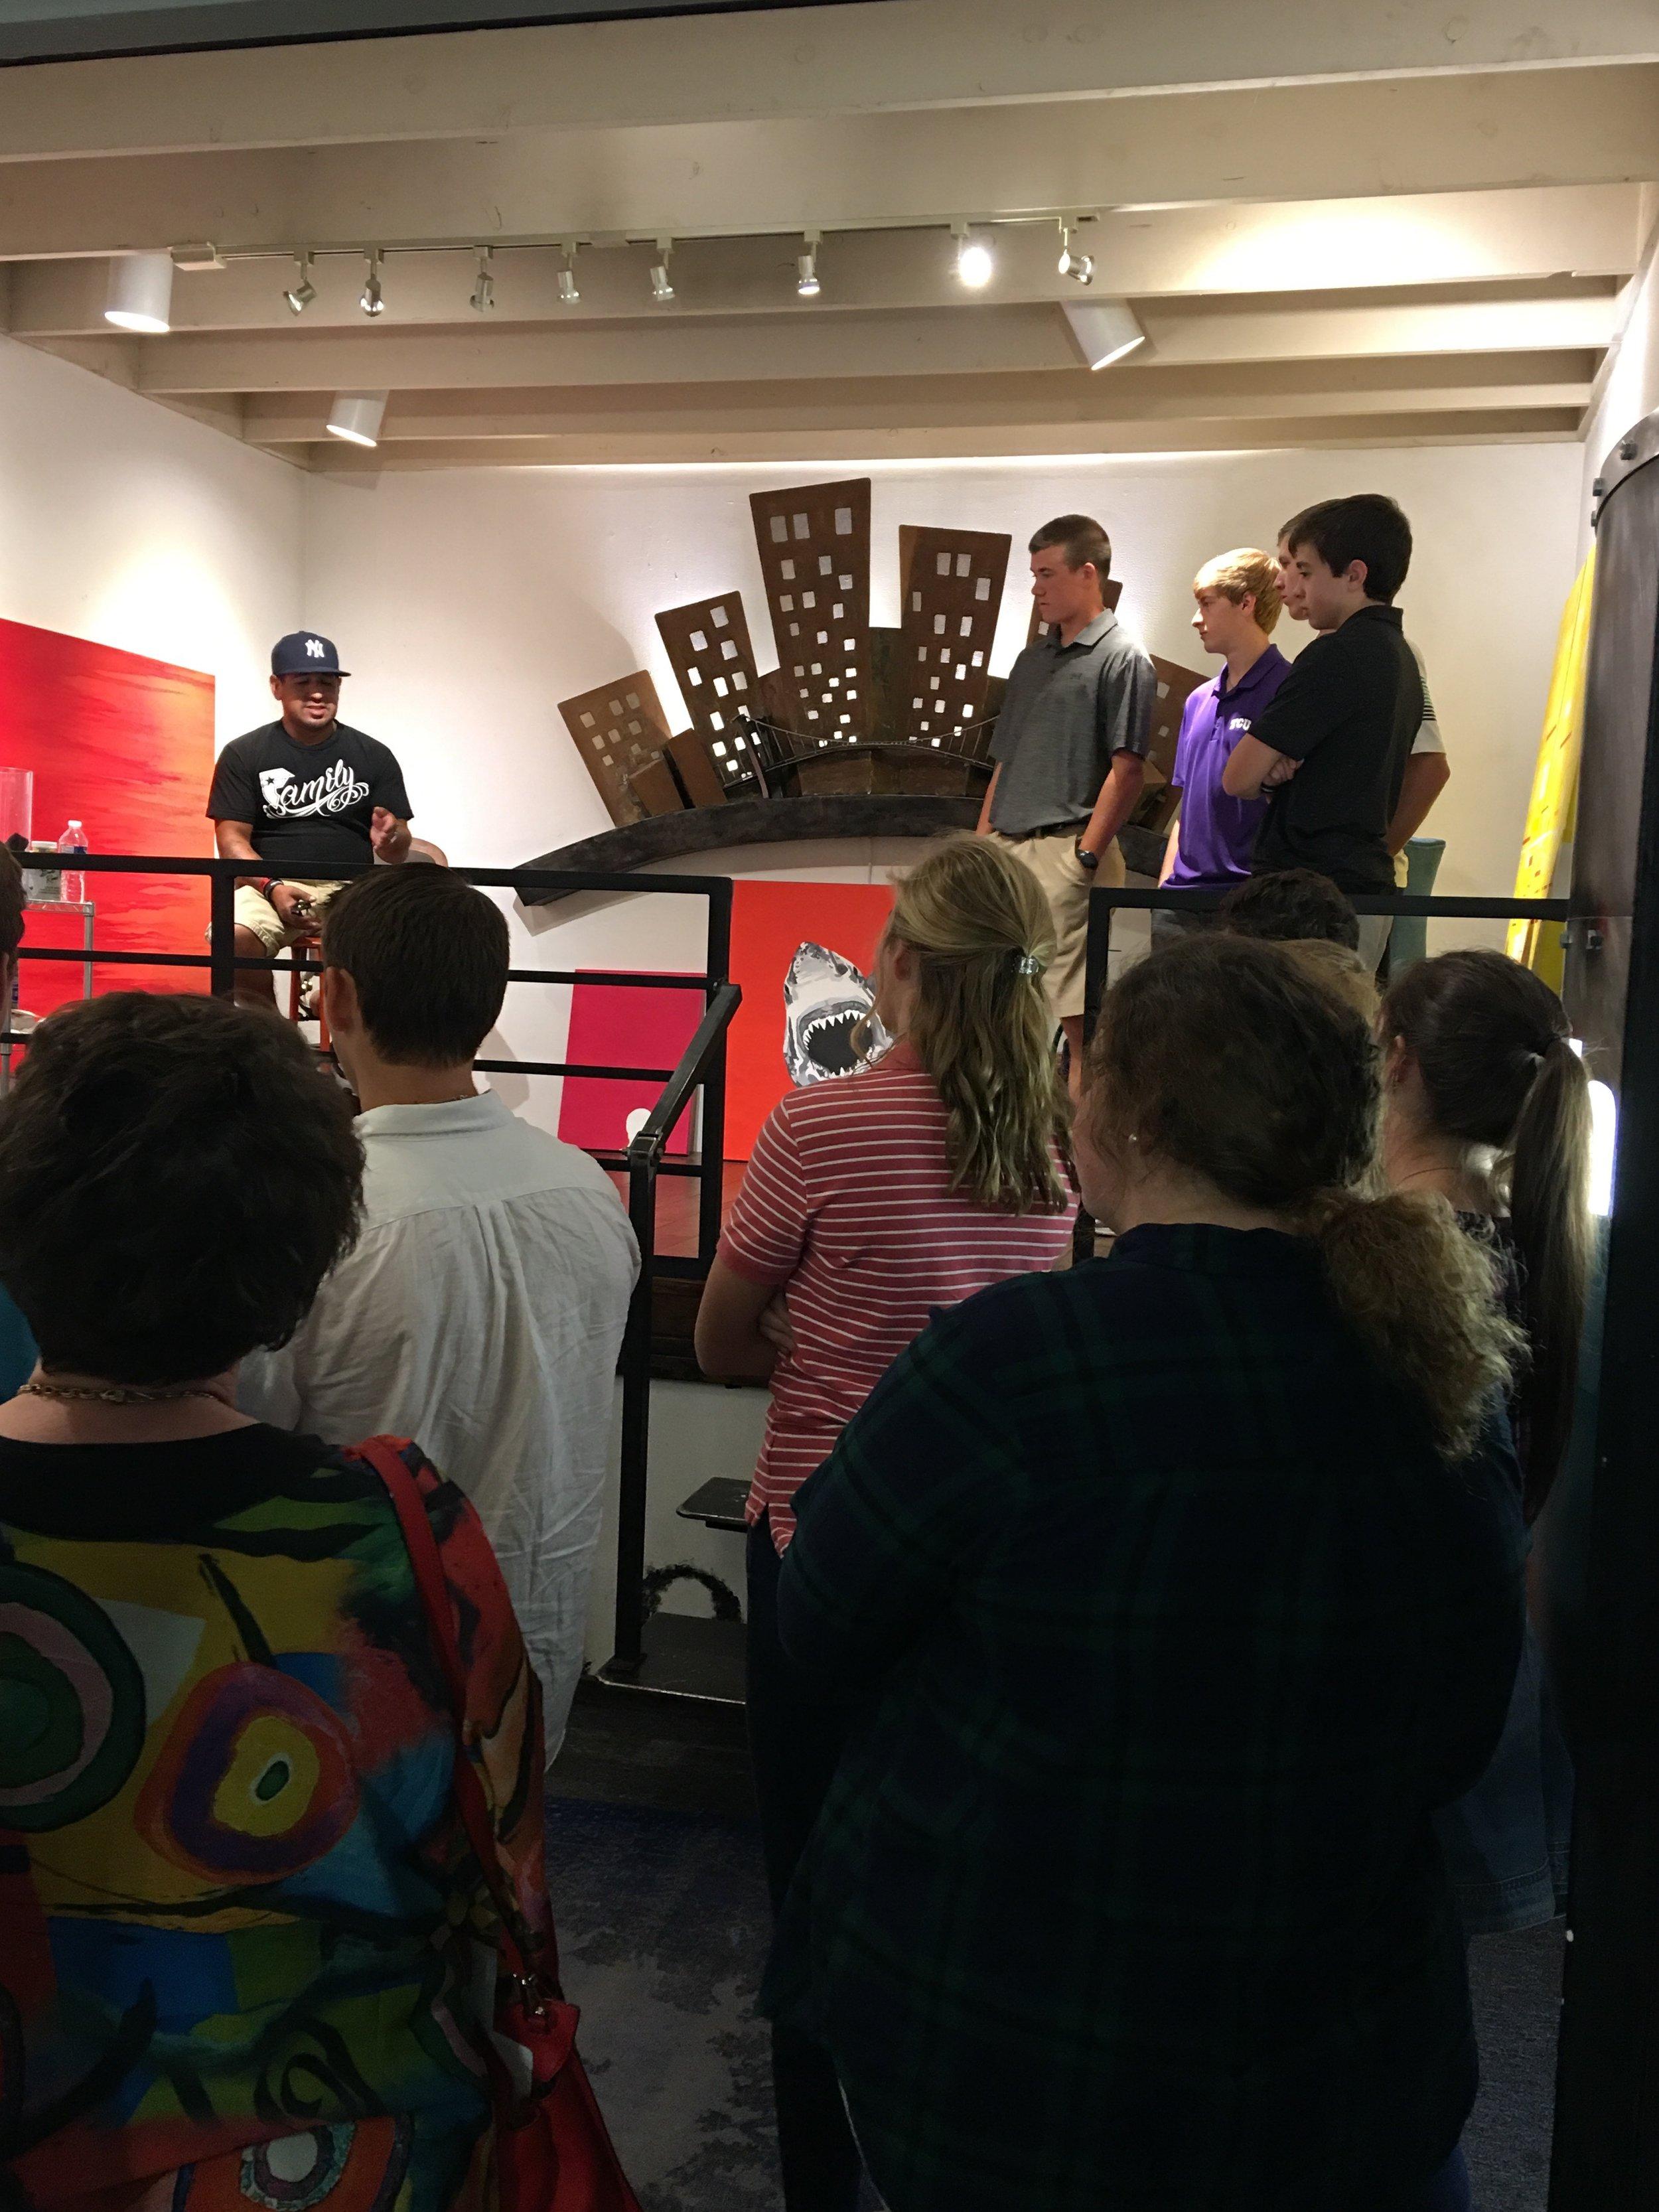 ARTIST JONAH LAMONICA SHARES HOW HIS ART CAREER BEGAN IN MIDLAND TX WITH MIDLAND CHRISTIAN HIGH SCHOOL ART STUDENTS